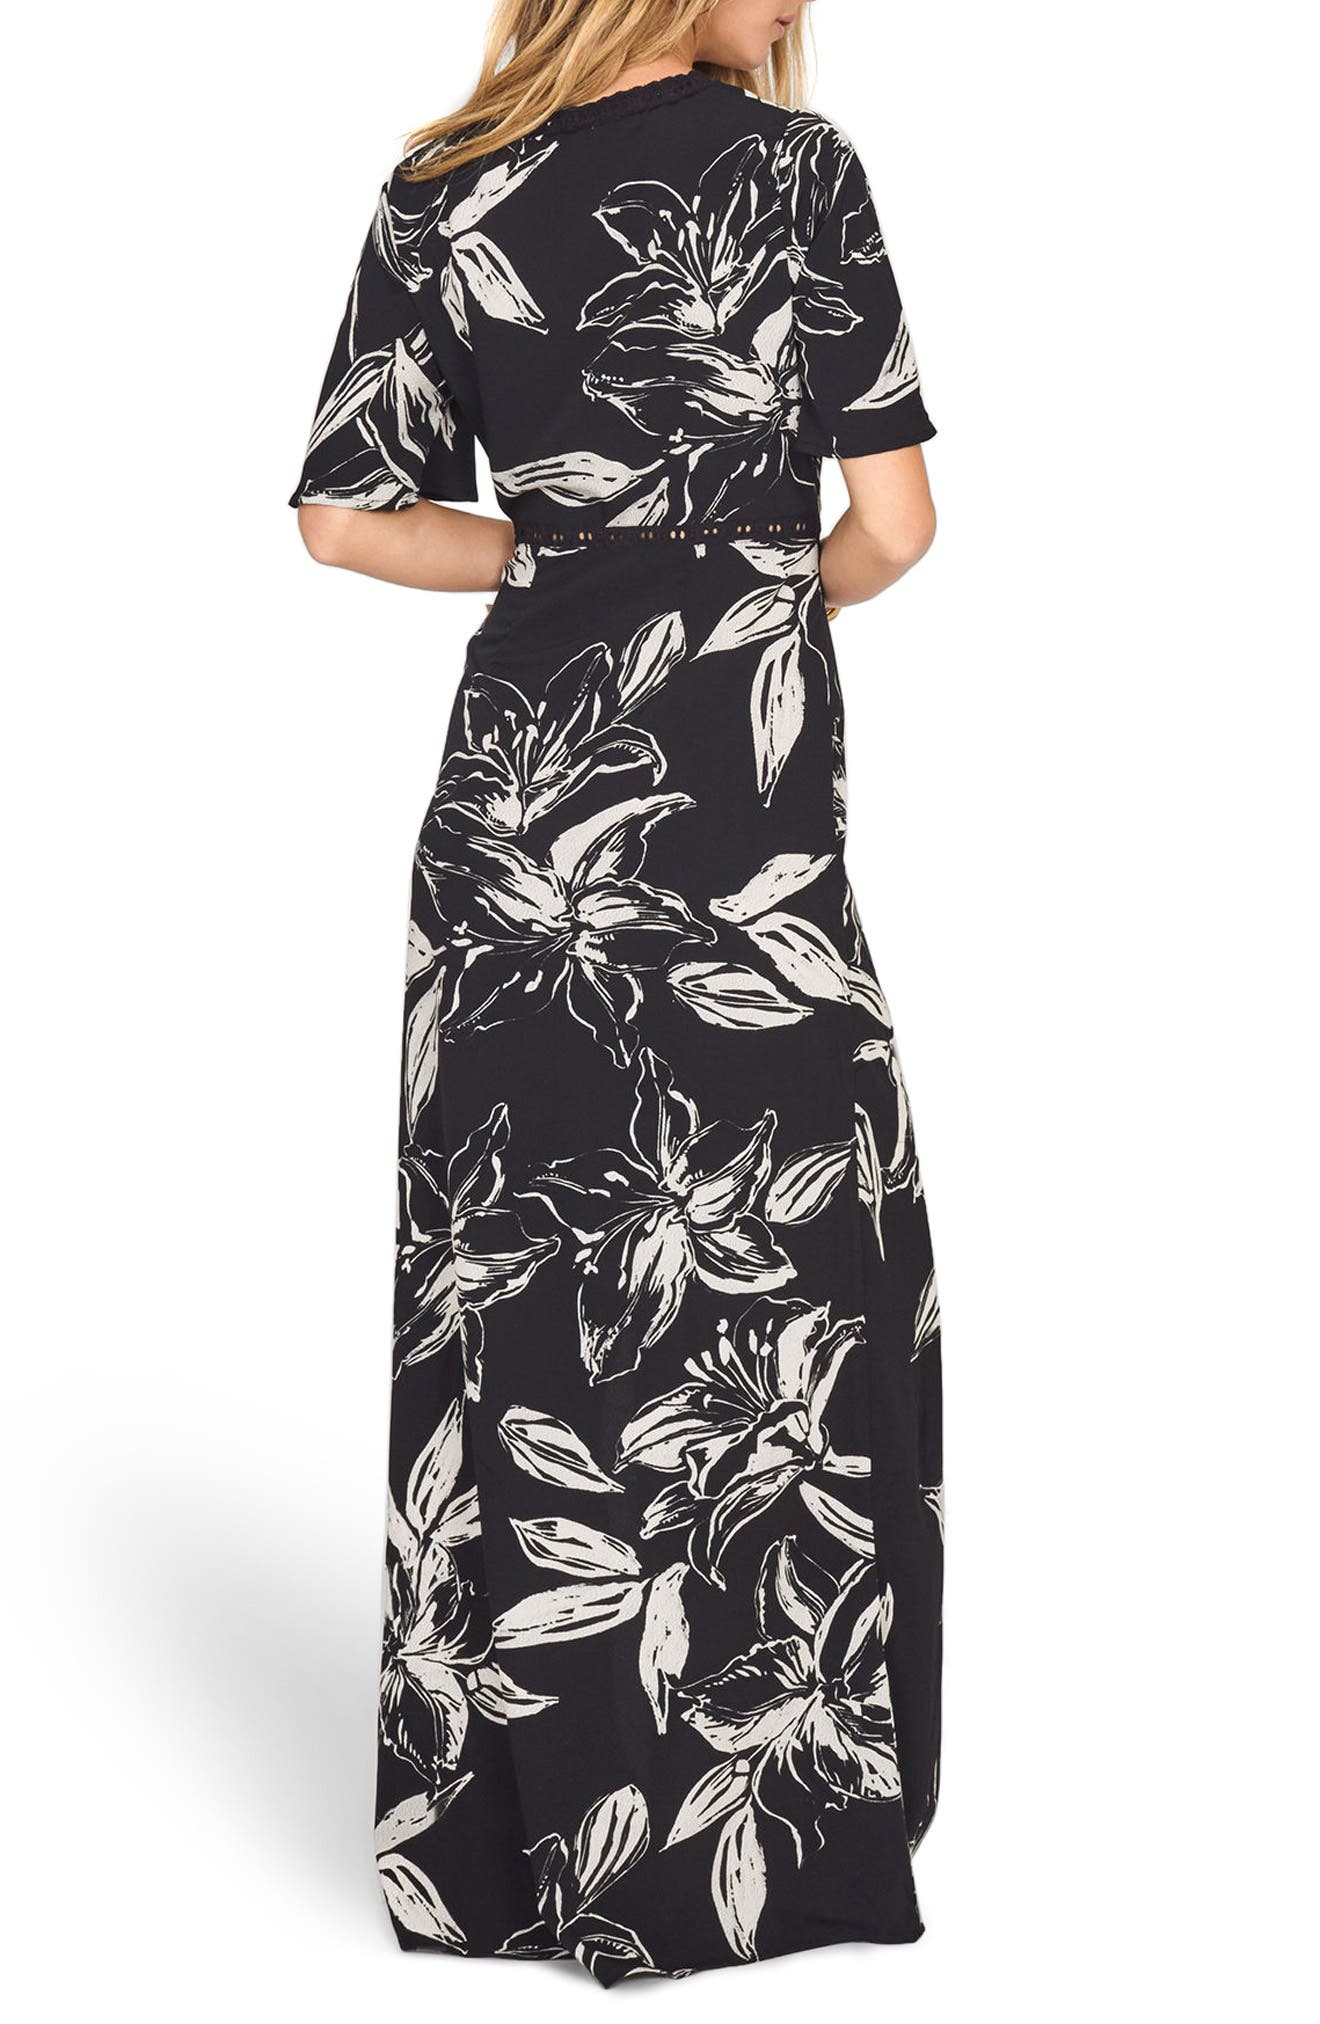 Seaside Floral Print Maxi Dress,                             Alternate thumbnail 2, color,                             001